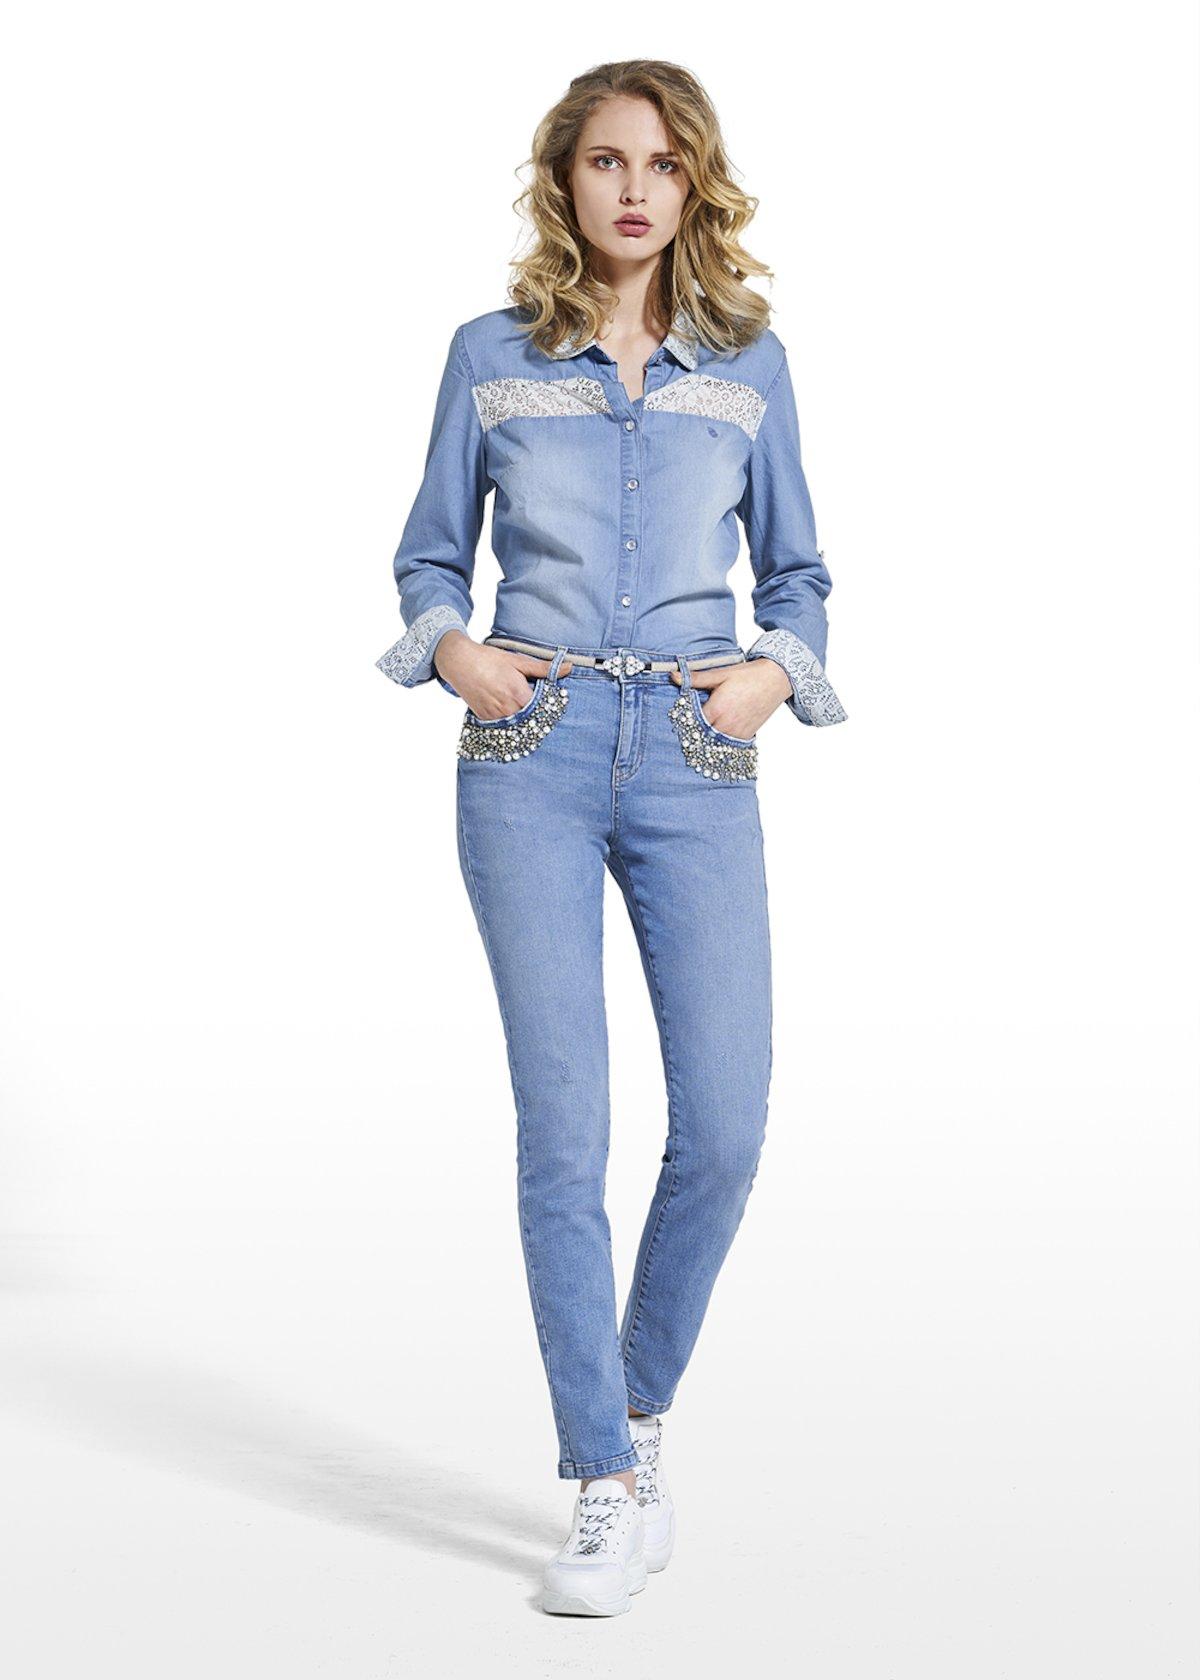 Jeans Dexter 5 tasche con dettaglio perline e crystal strass - Denim -  Donna - Immagine eecbd09b6f1